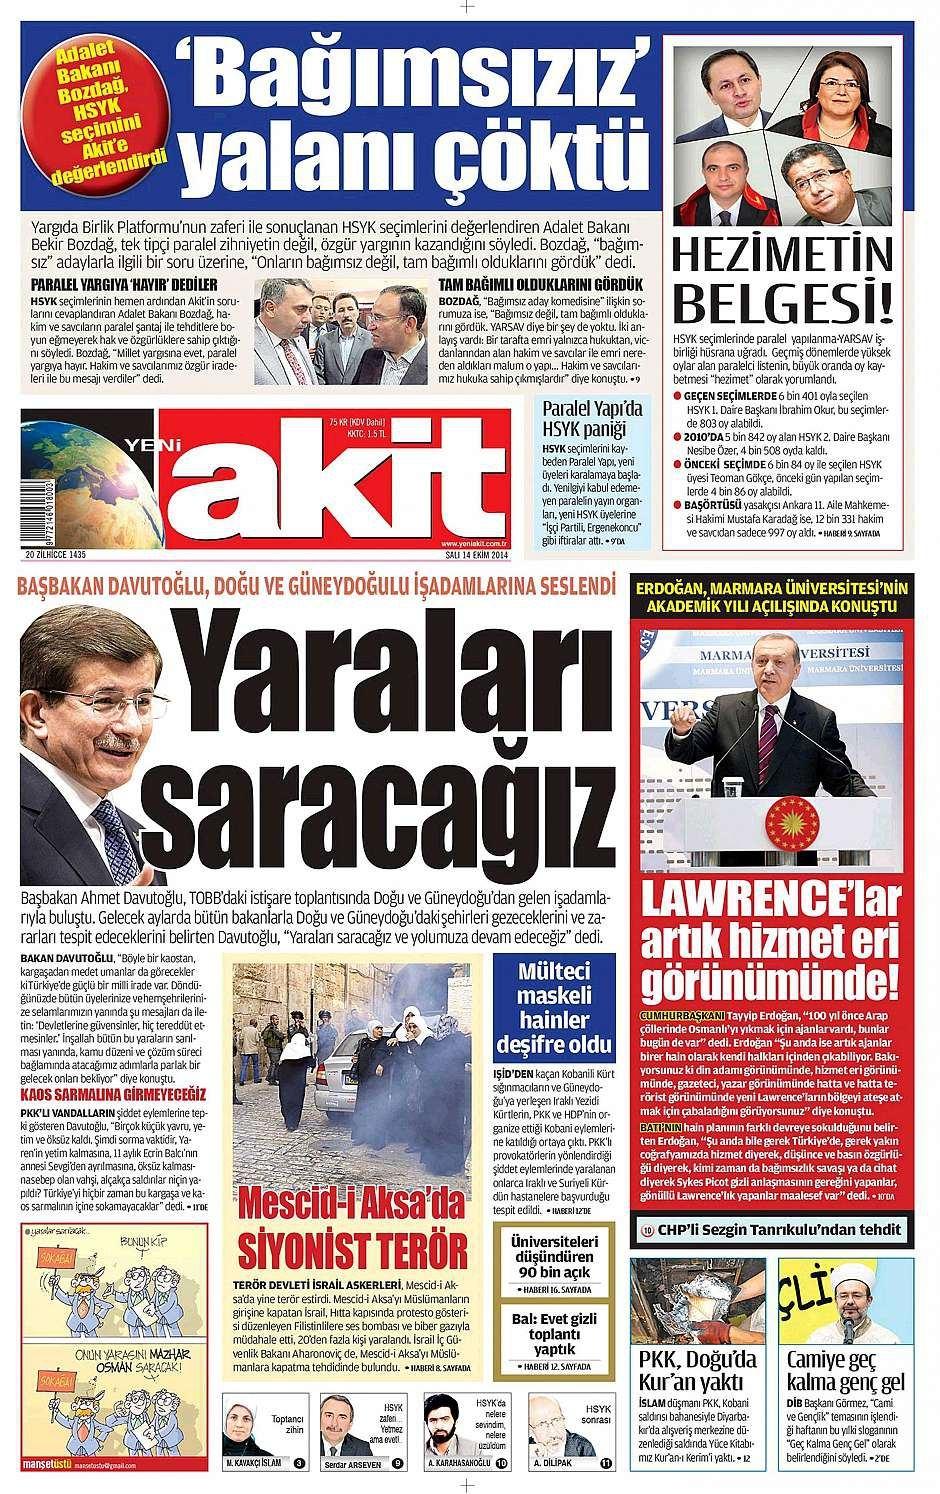 14 Ekim 2014 gazete manşetleri 22